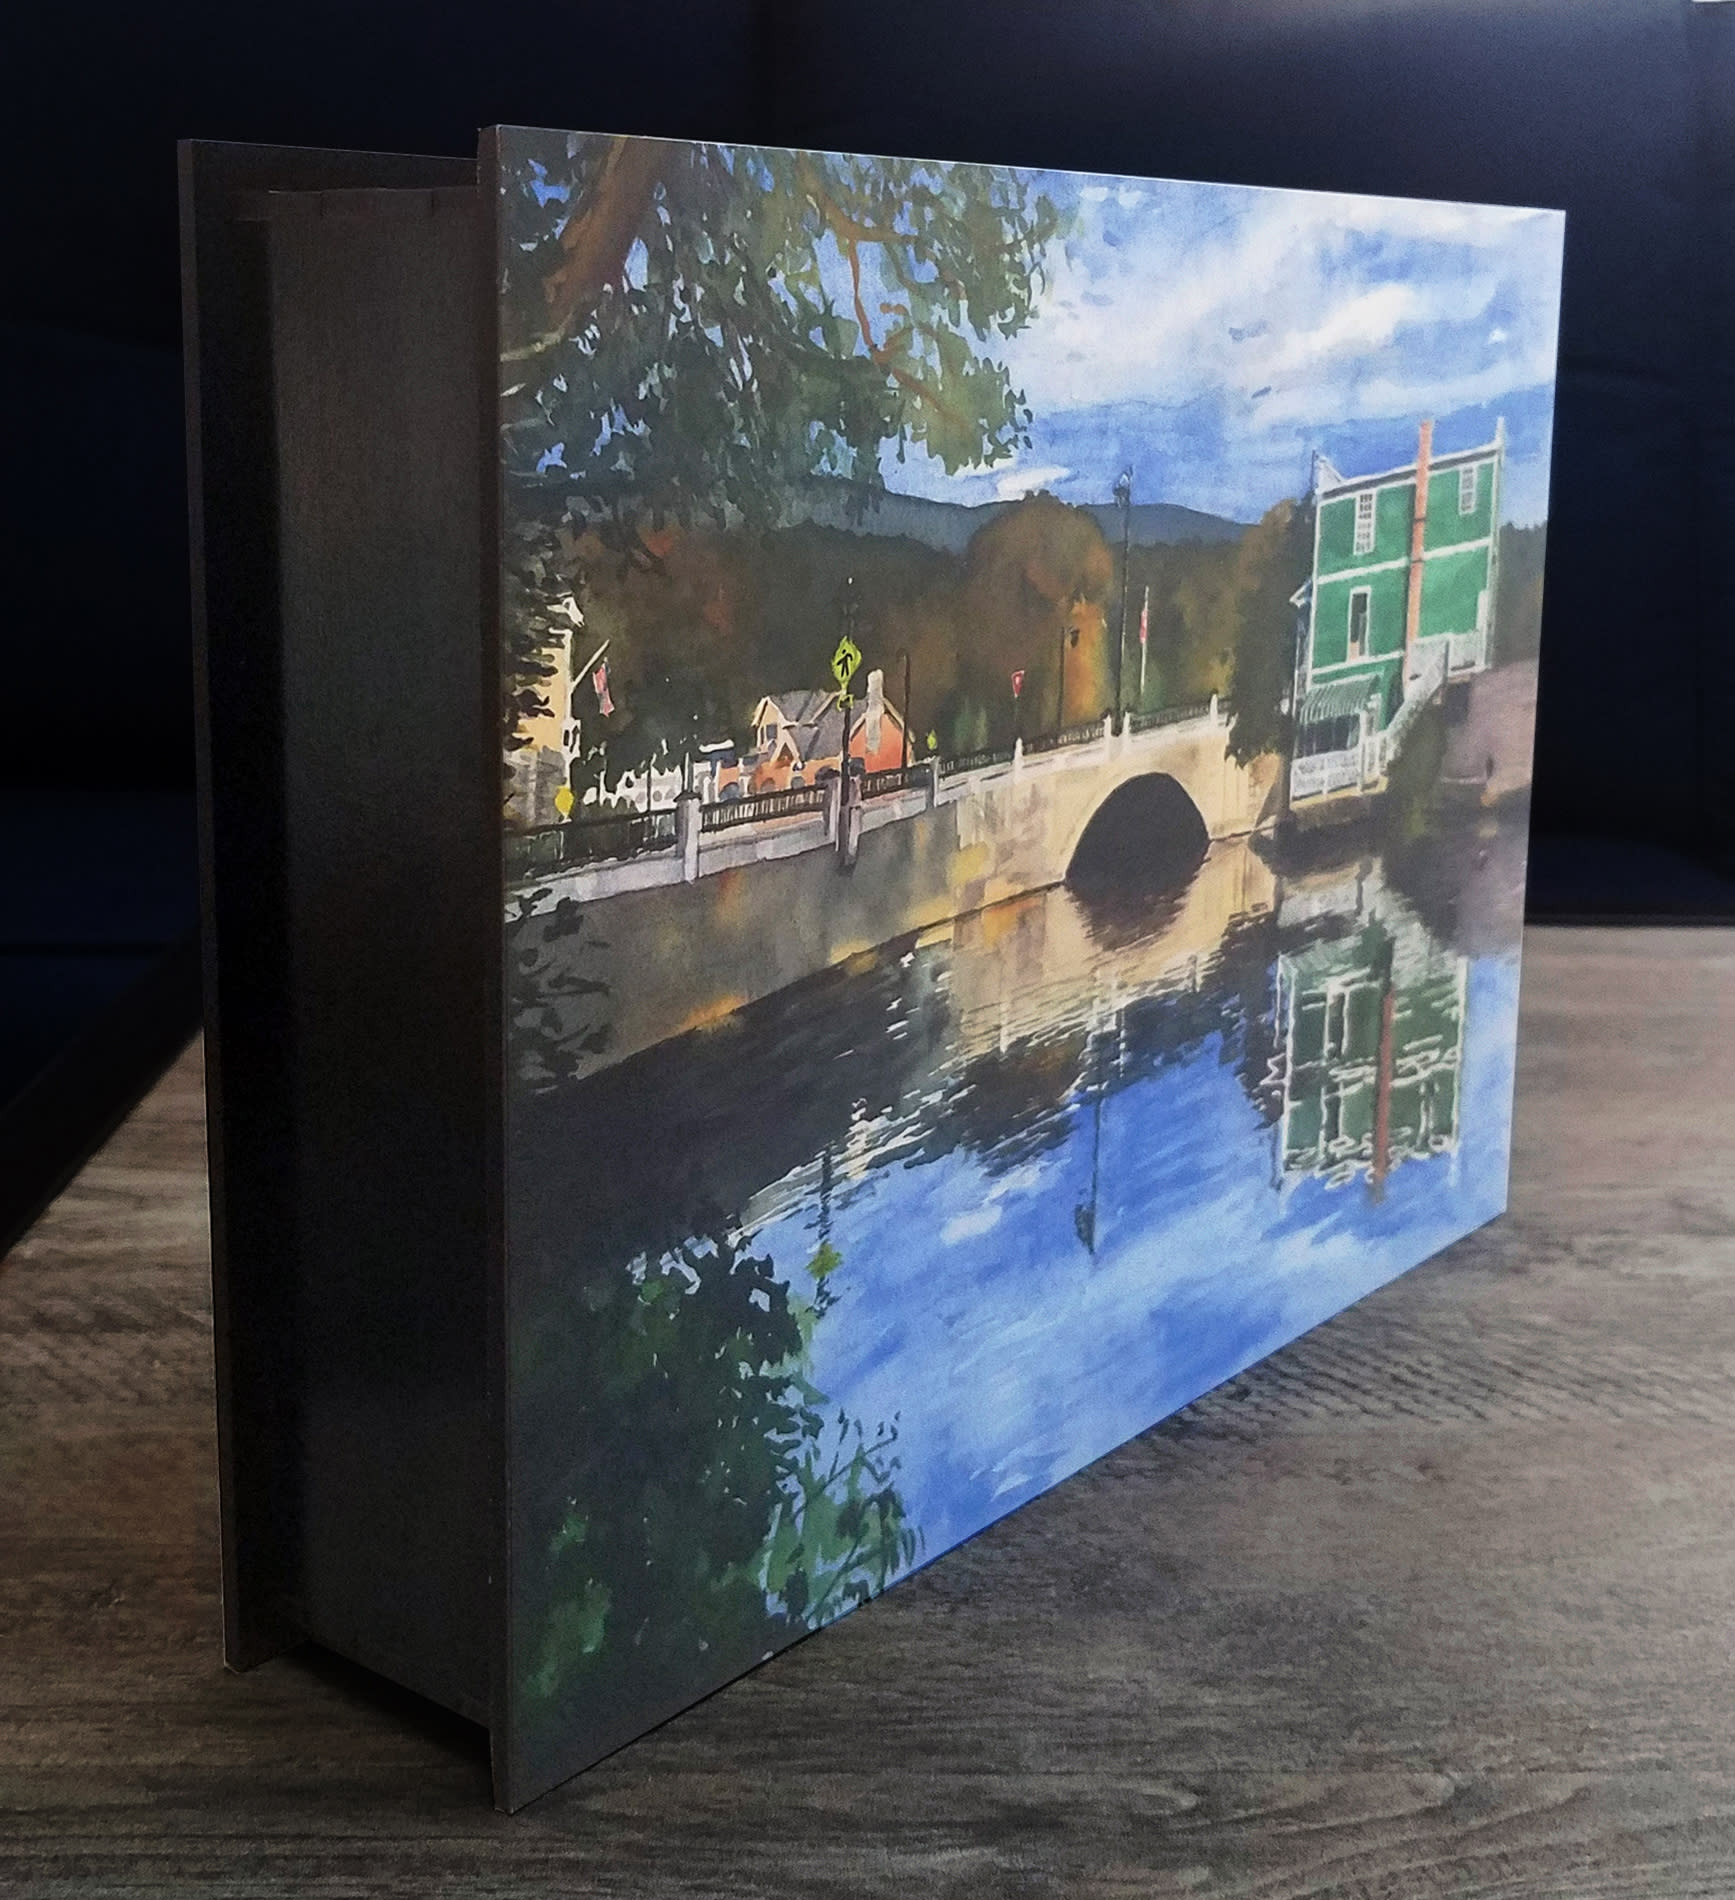 Mill pond  03s zsxvqc